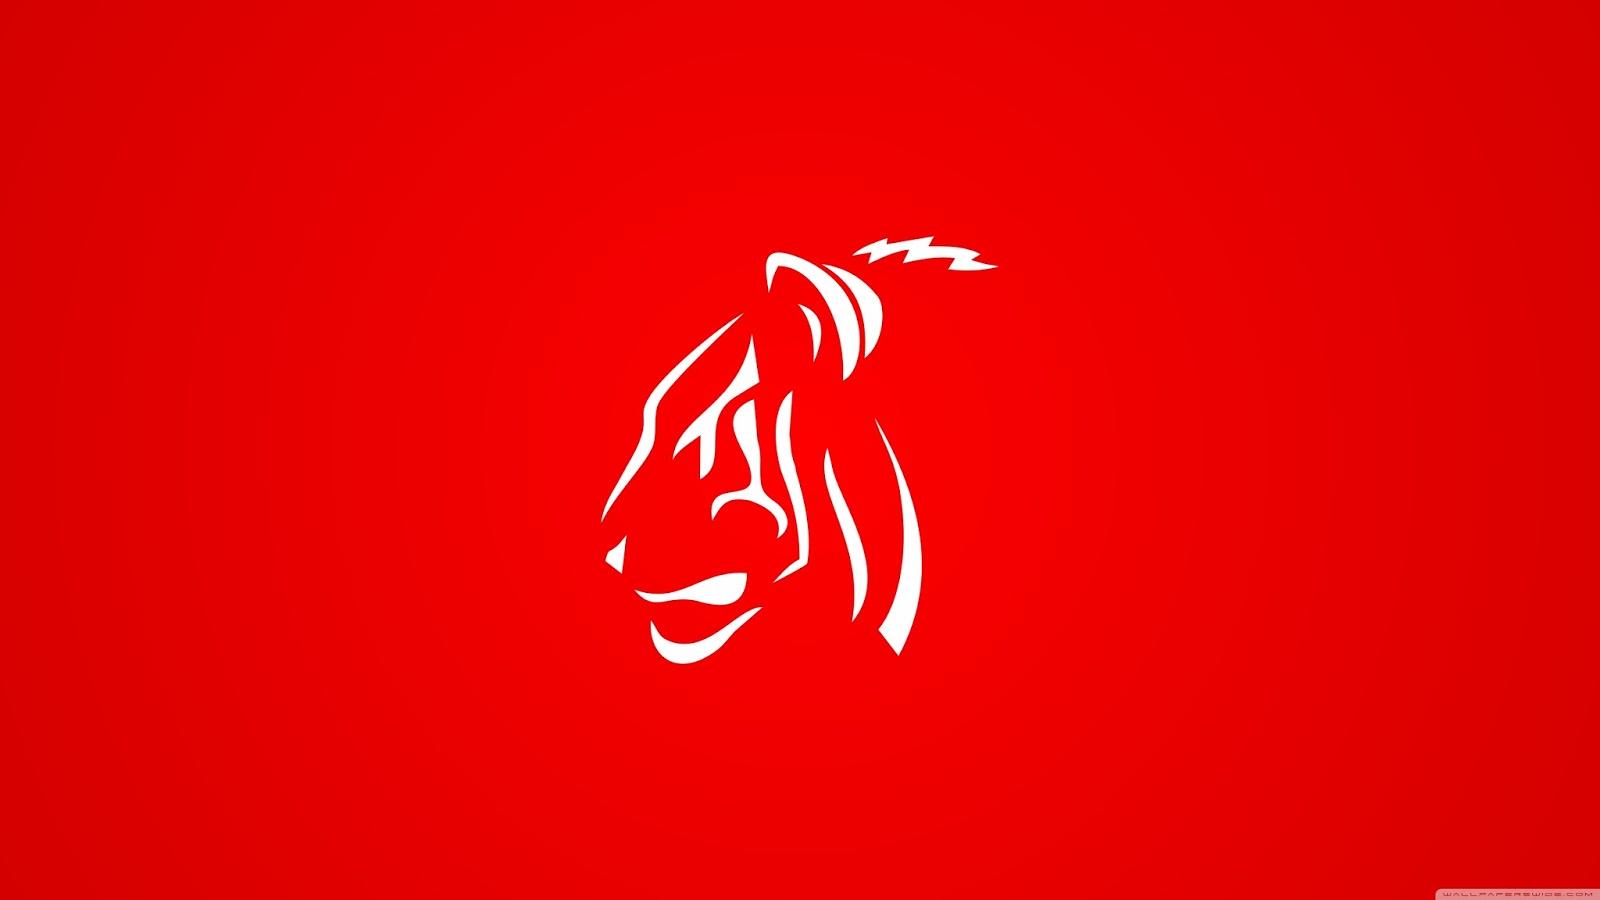 Top Wallpapers Free Download Tiger Vector Wallpaper 4k 3840x2160